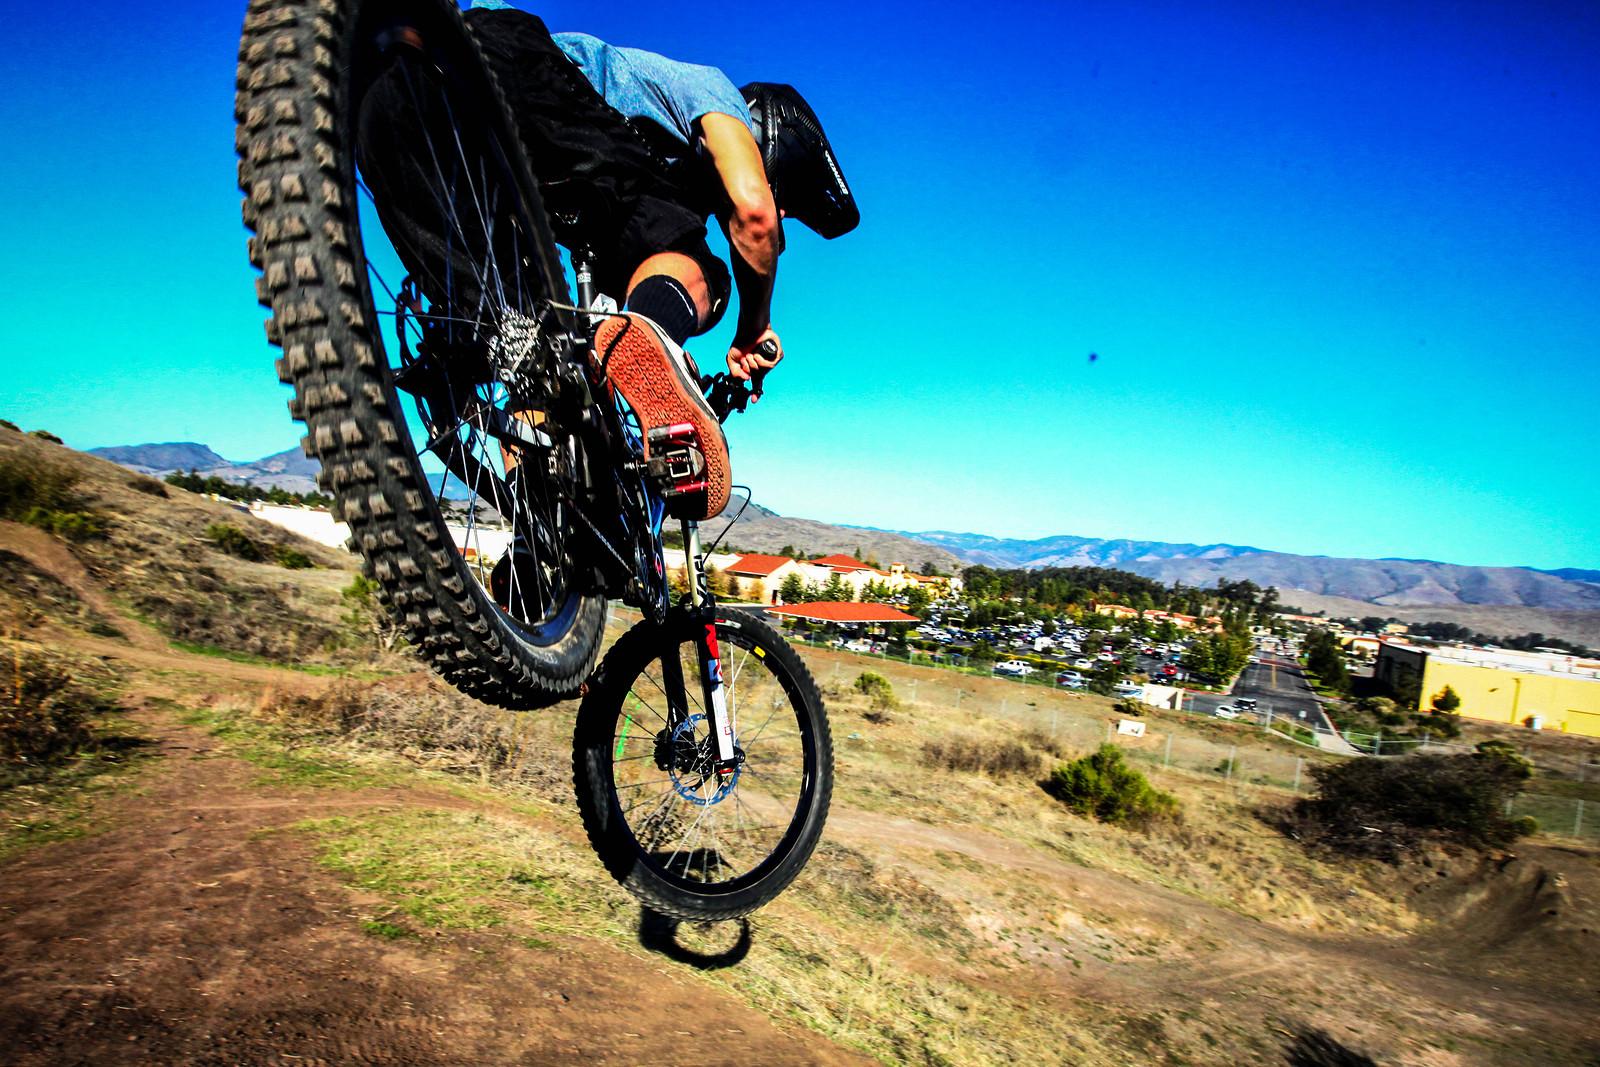 jordan gettin sideways - GnarHuck - Mountain Biking Pictures - Vital MTB